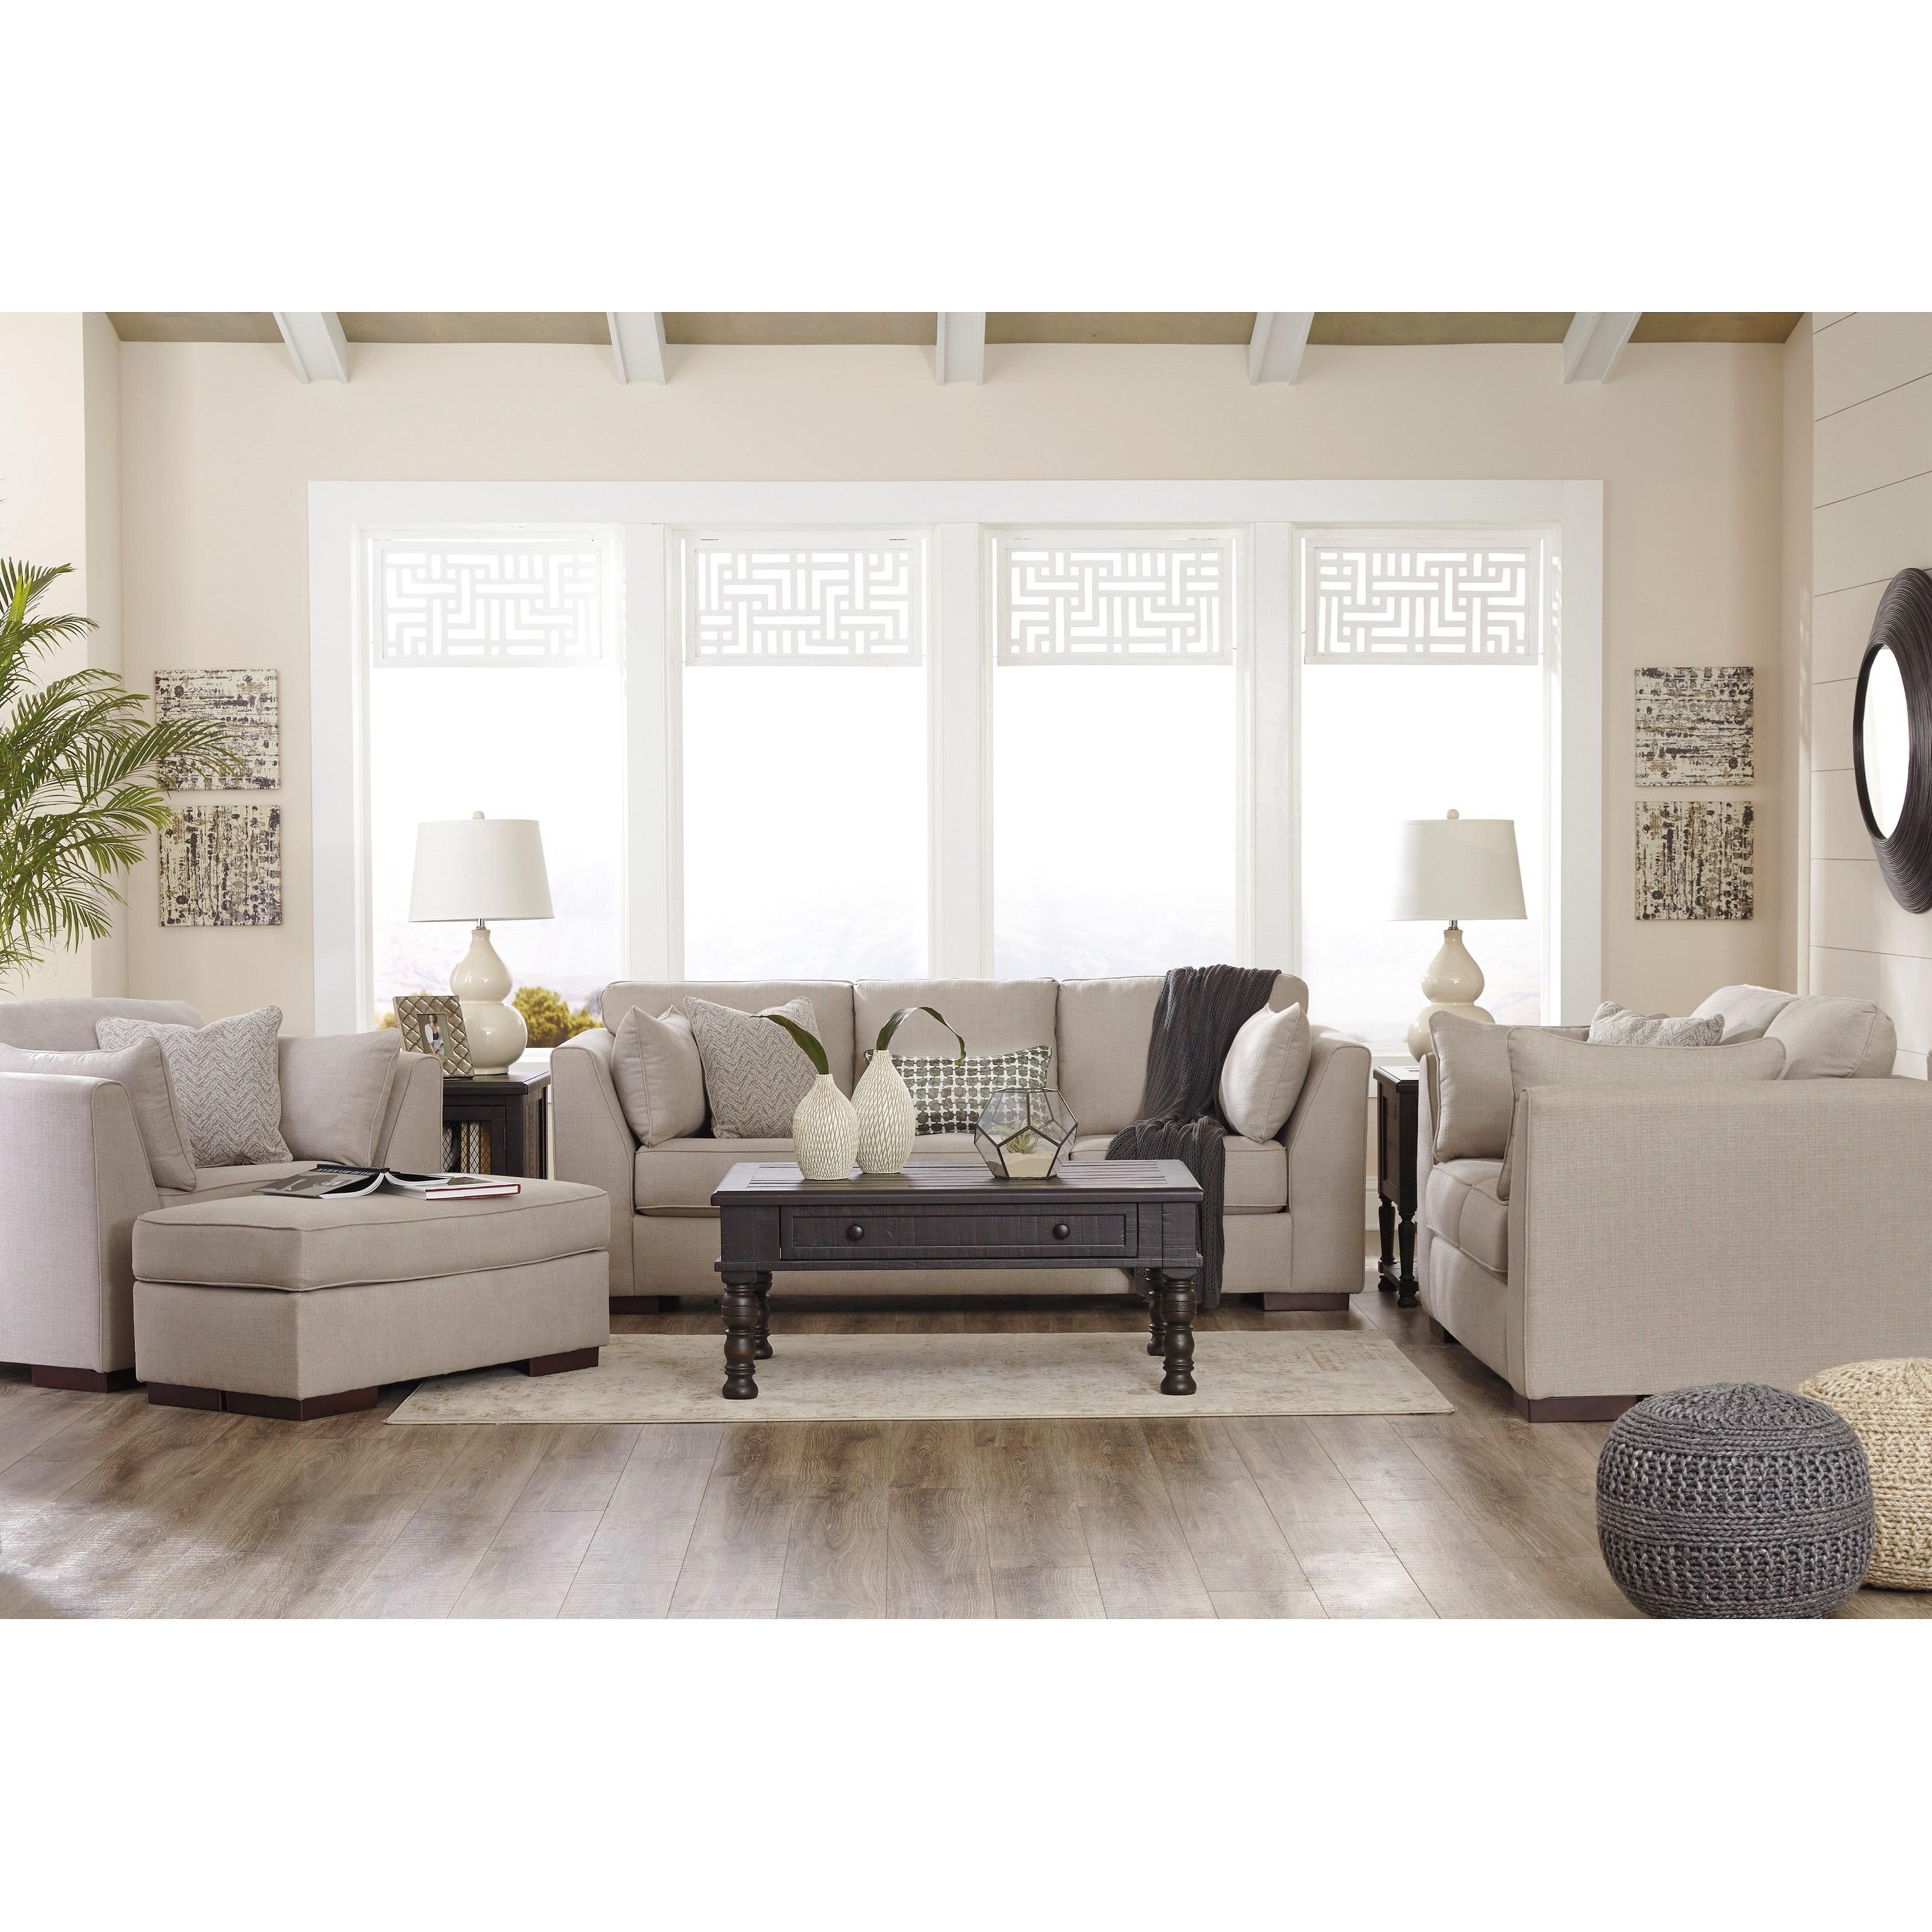 Ashley/Benchcraft Lainier Stationary Living Room Group - Item Number: 54202 Living Room Group 3